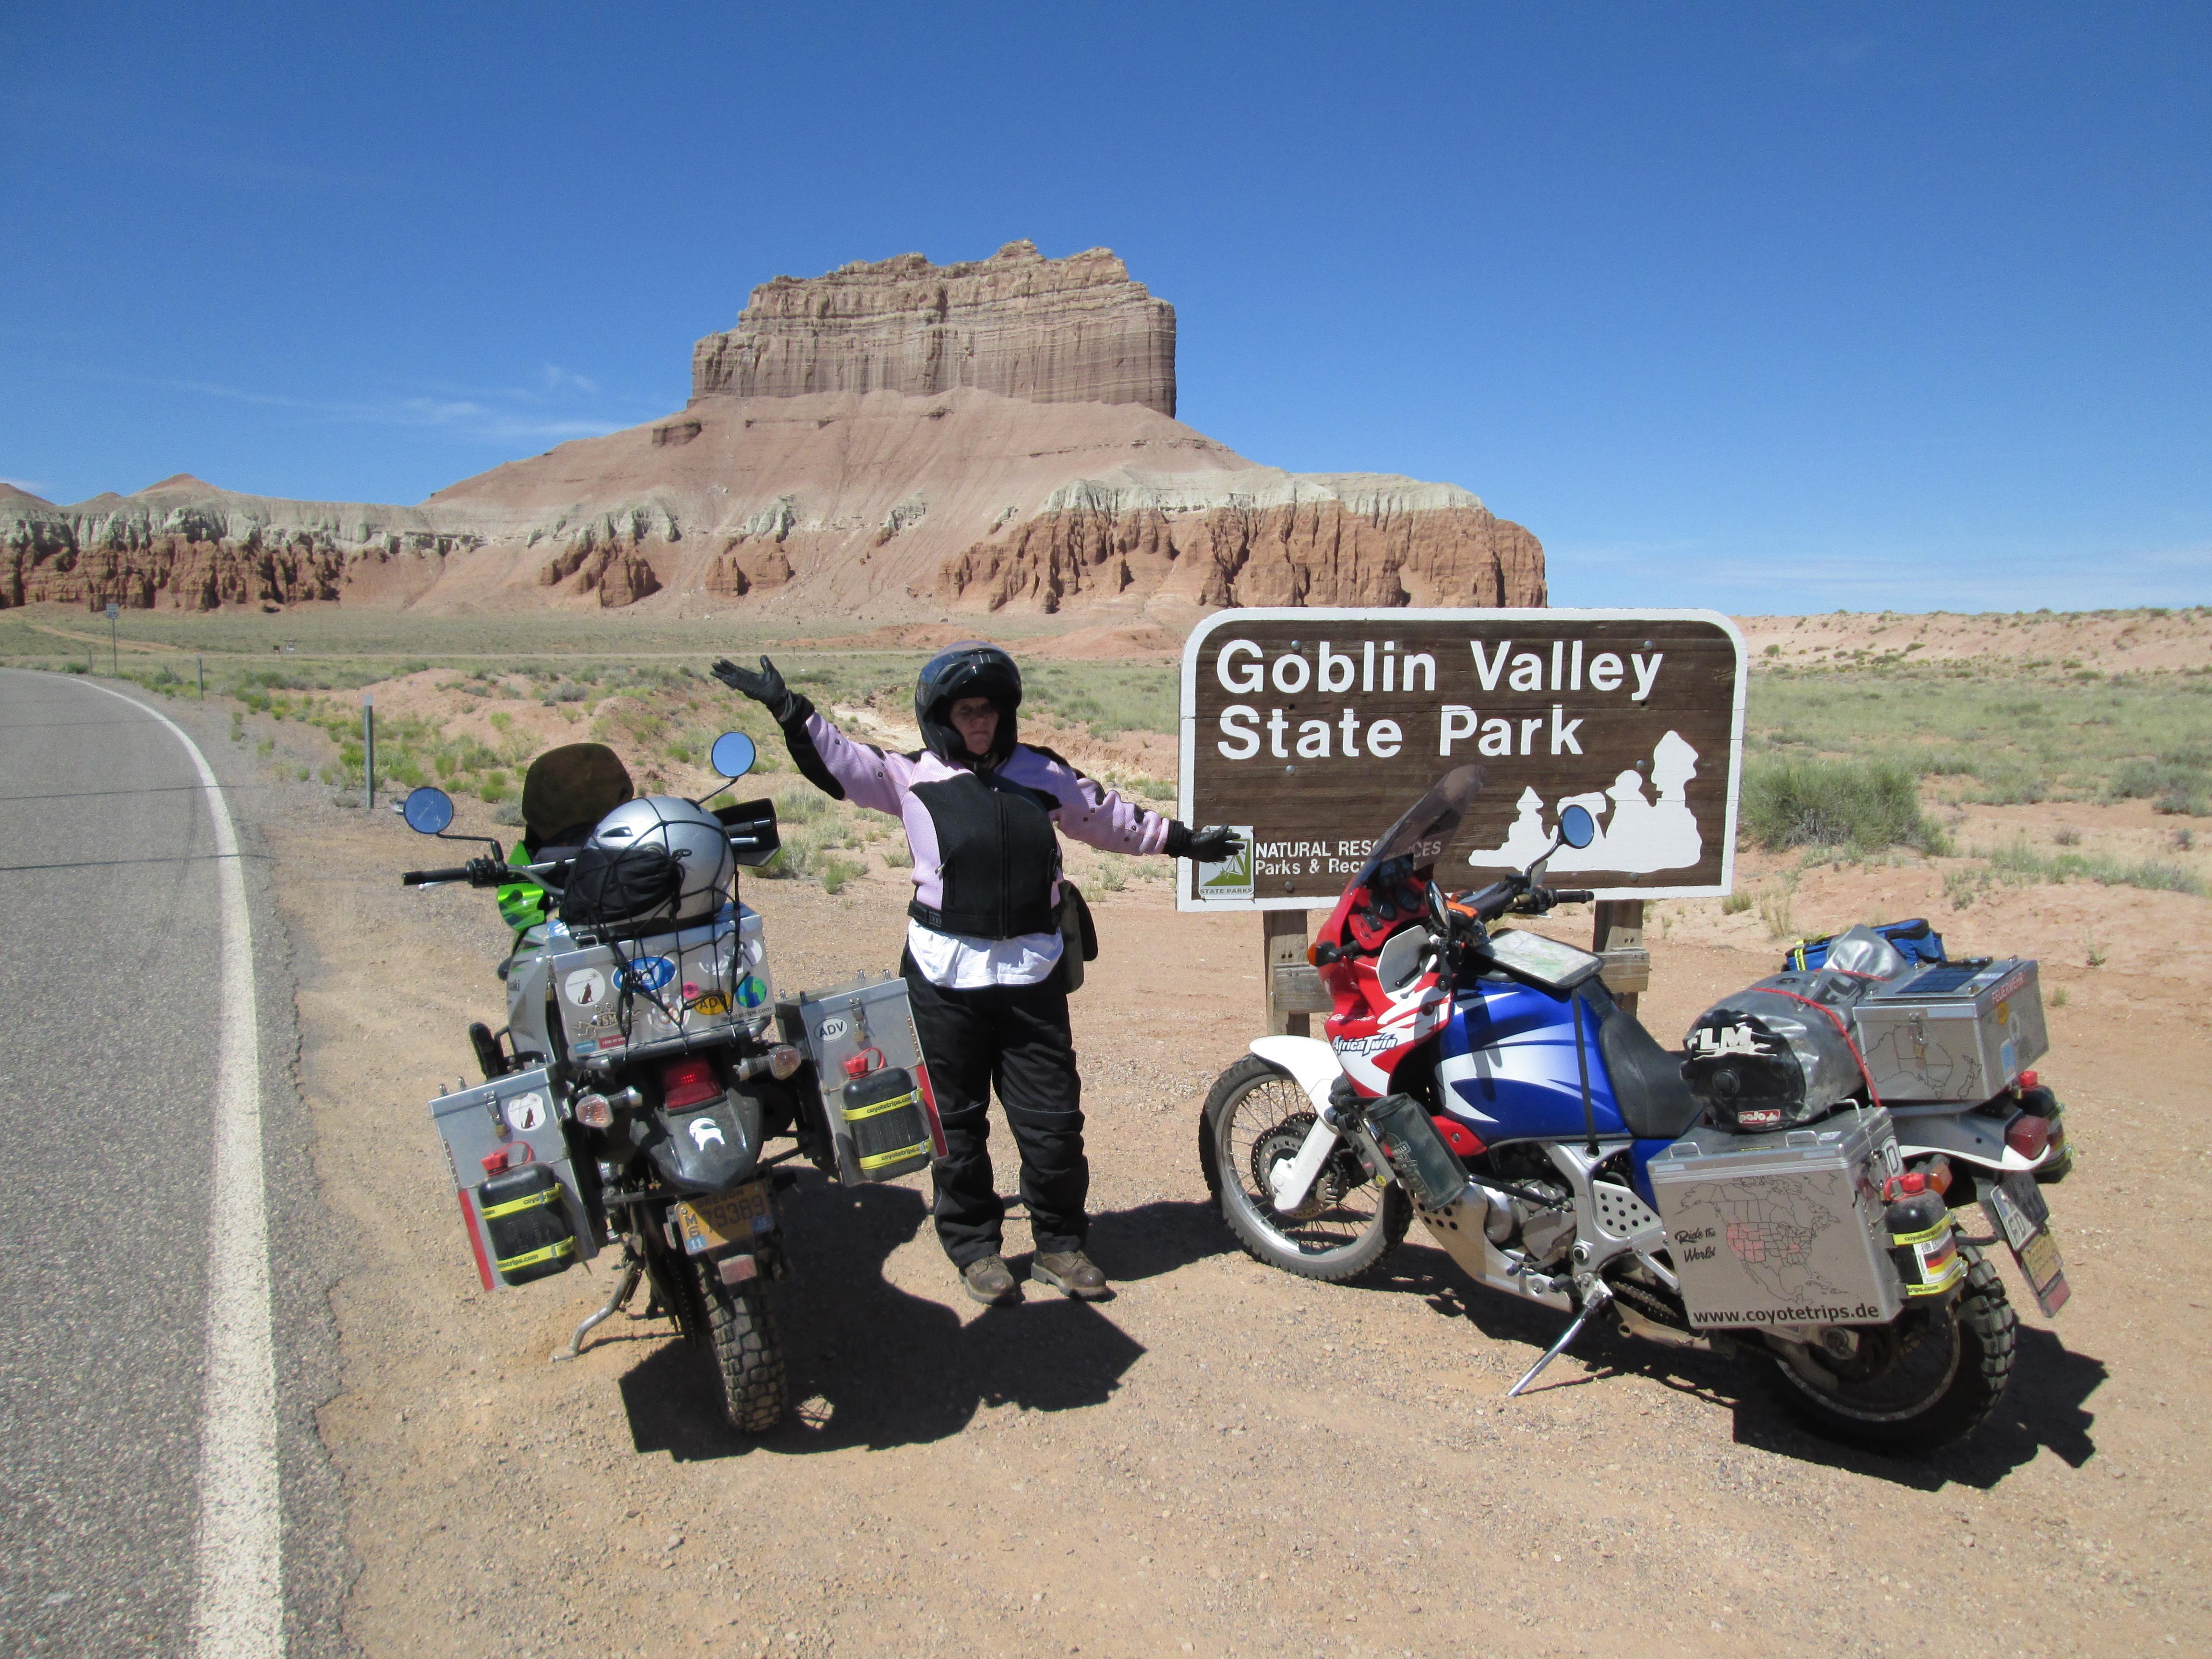 me at Goblin Valley